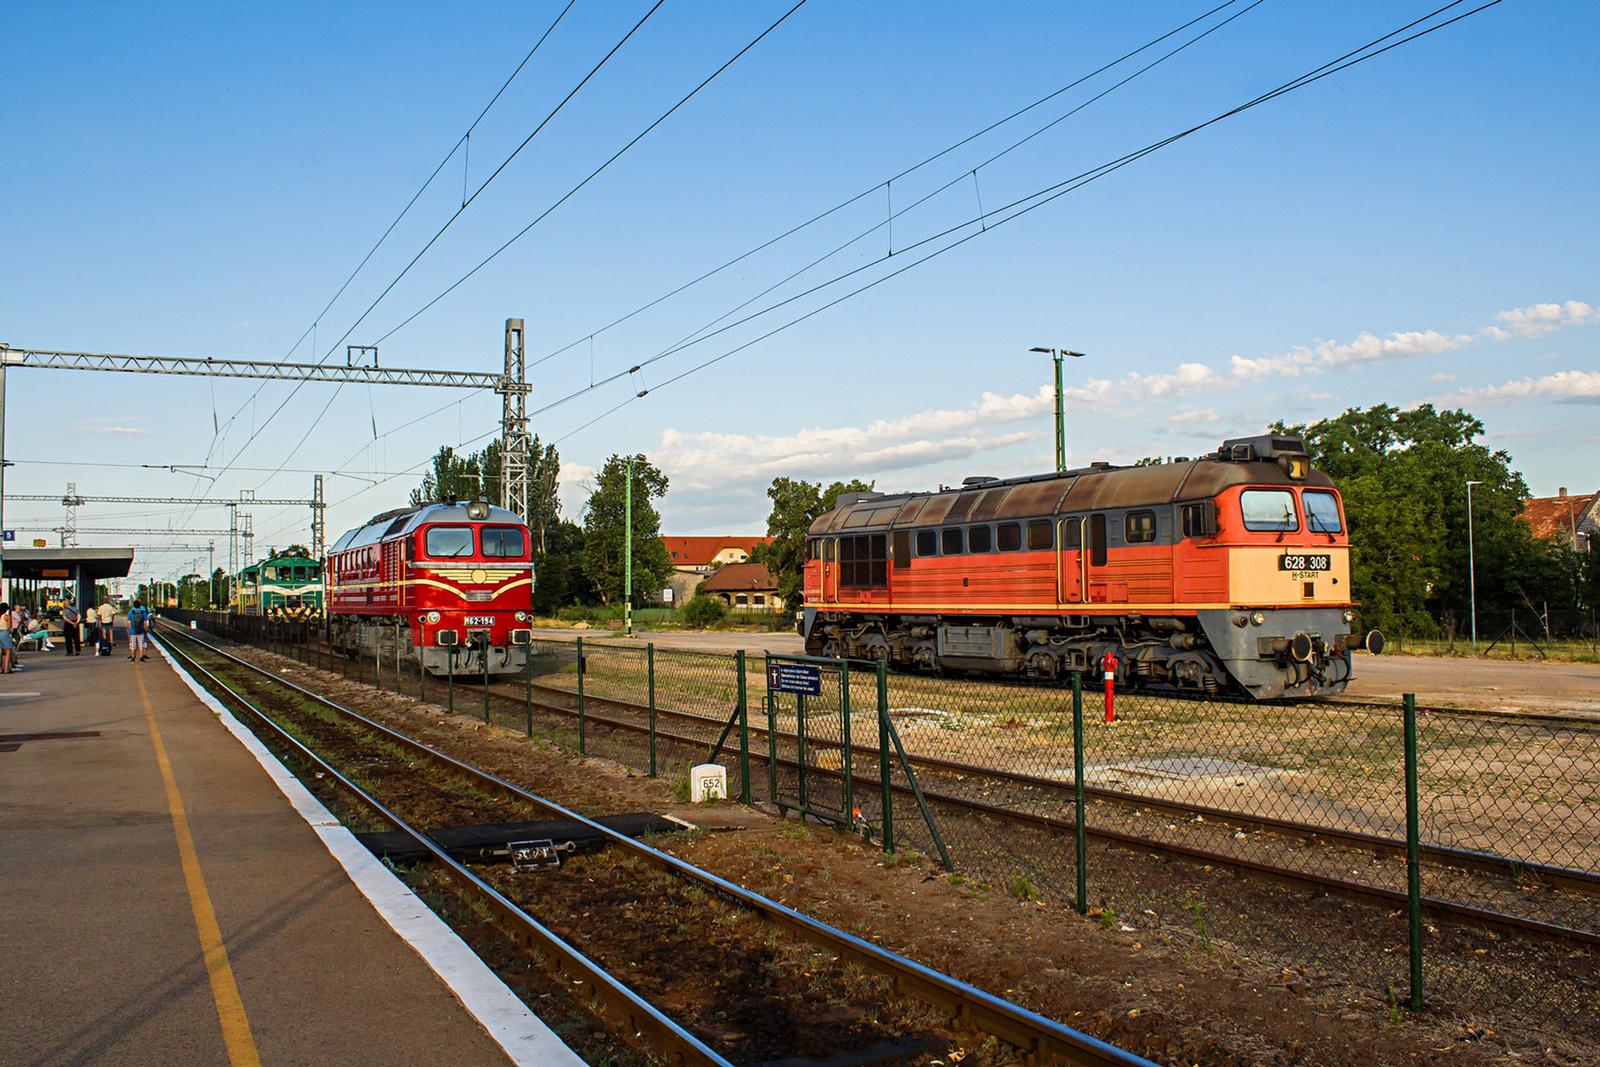 628 308 Balatonfüred (2021.07.10)